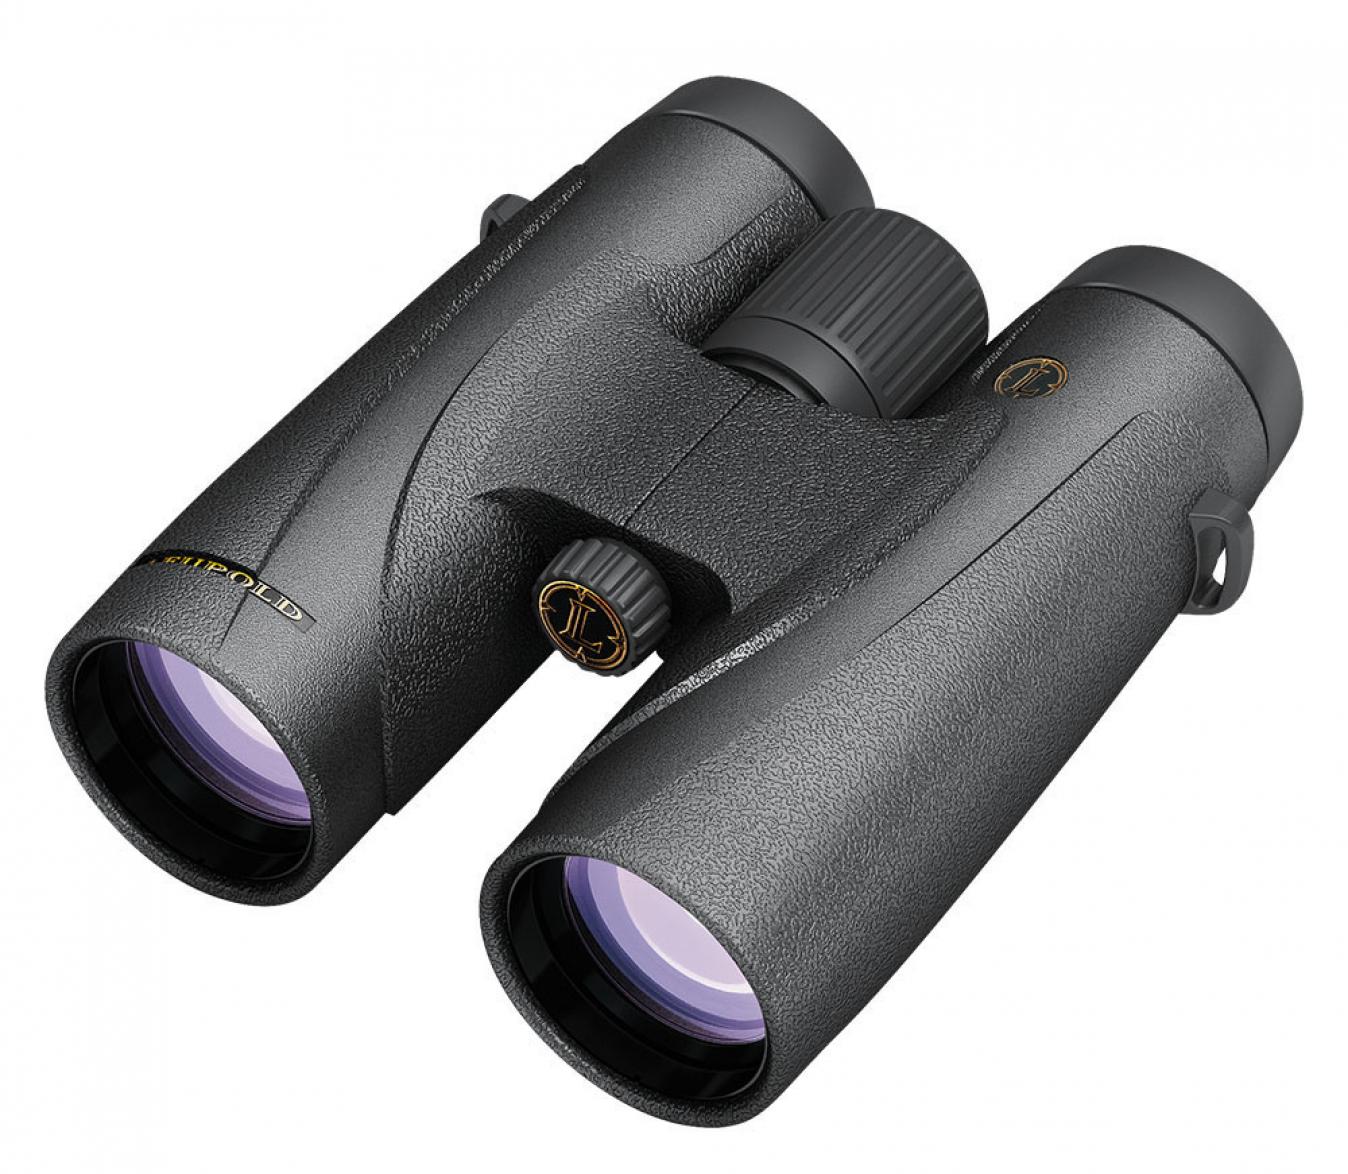 Leupold 8x42 W2 Binoculars Owners Manual 2019 Ebook Library